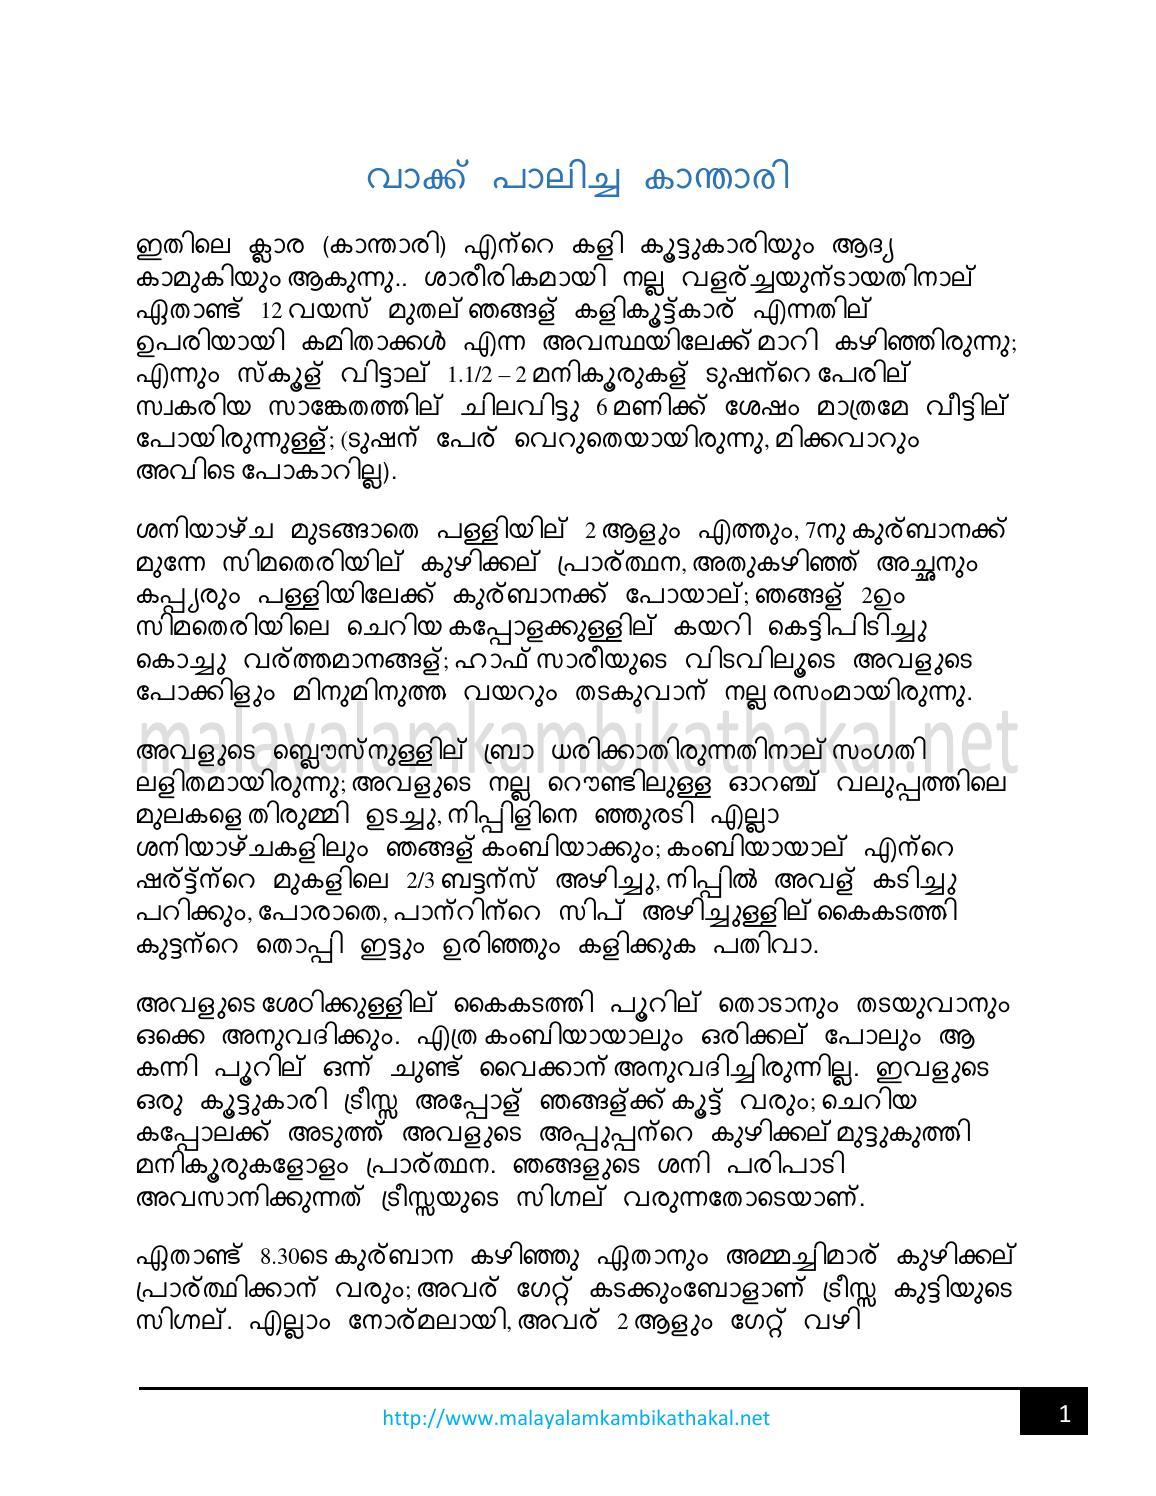 malayalam kambi kathakal groups